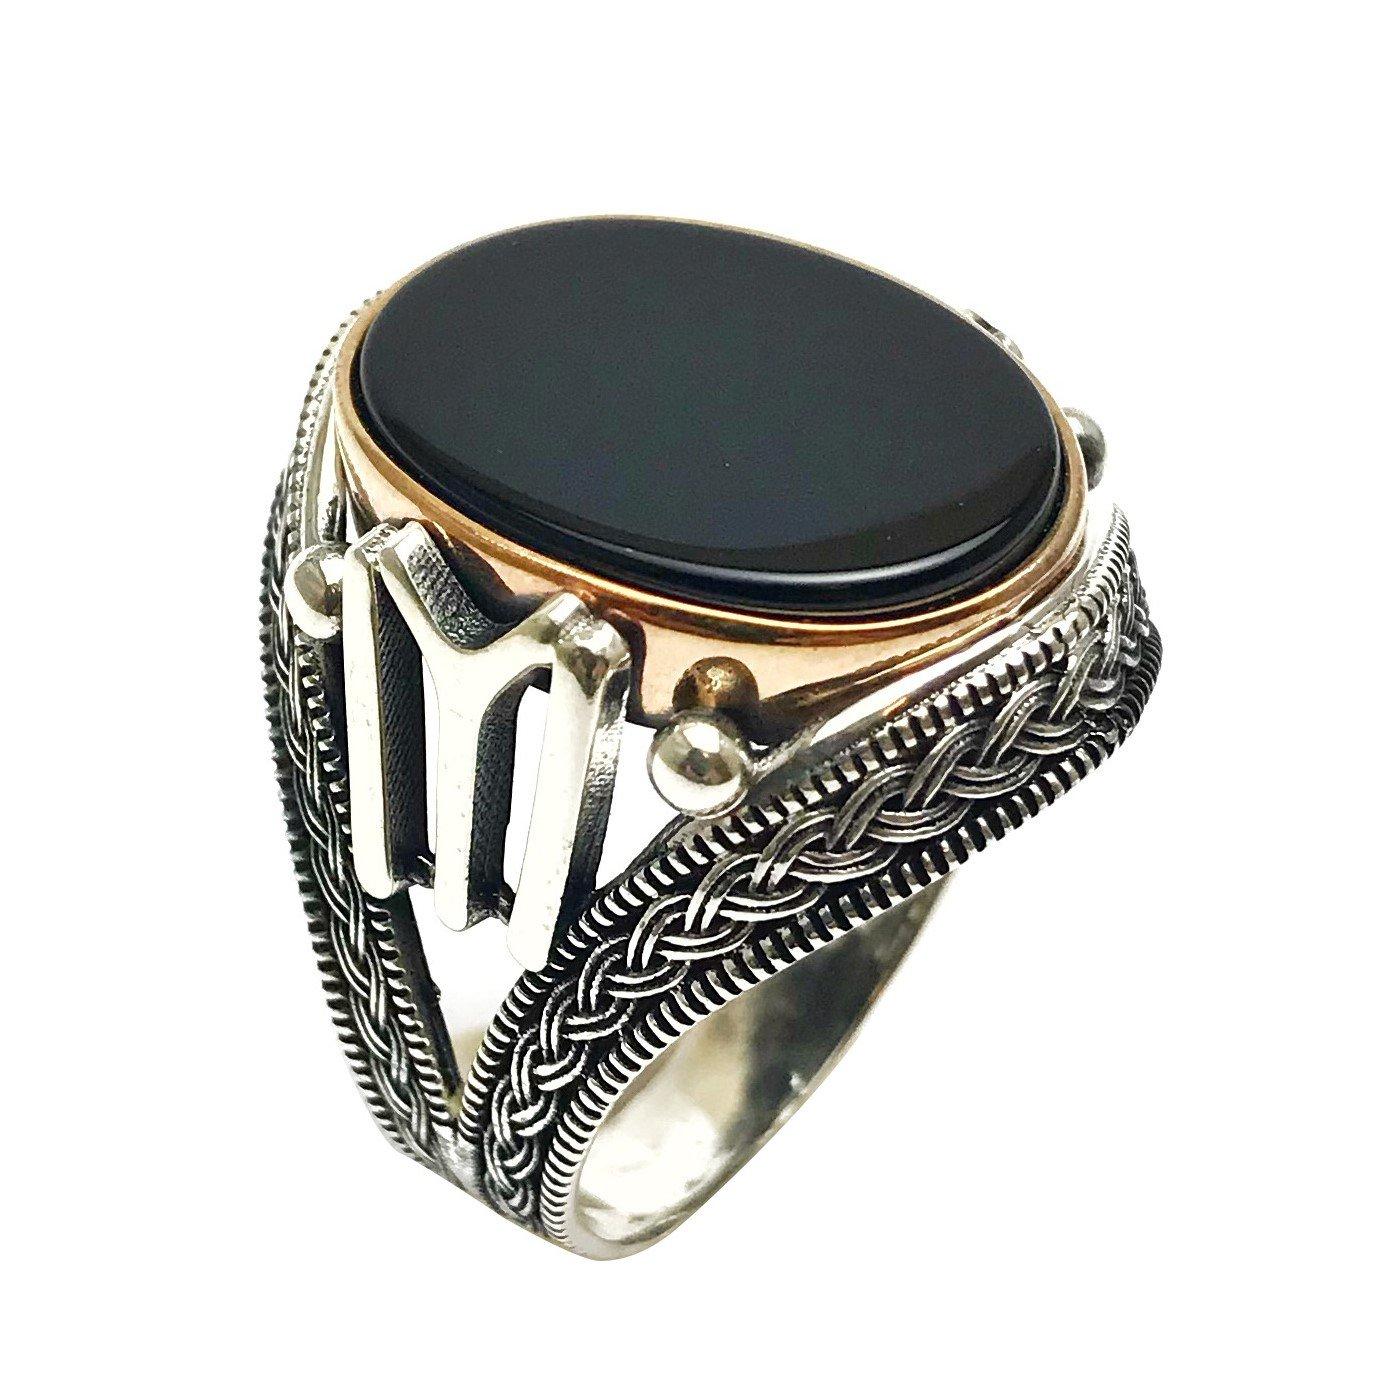 argunjewellery Turkish Jewelry Ertugrul Kayı IYI Dirilis Onyx 925K Sterling Silver Men's Ring